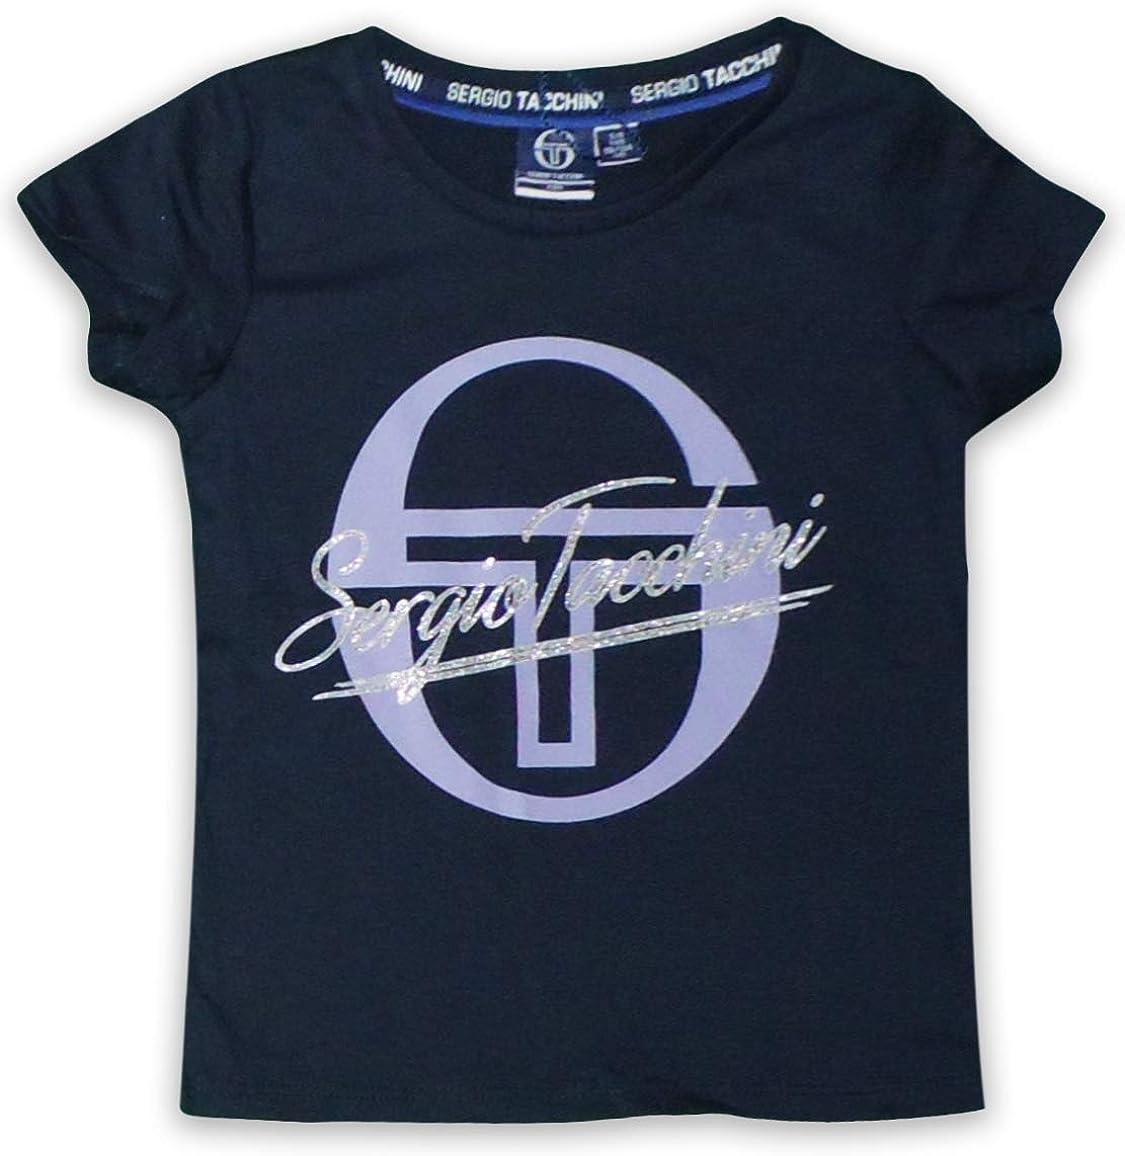 Sergio Tacchini M/ädchen Sport-T-Shirt Baumwolle kurz/ärmlig